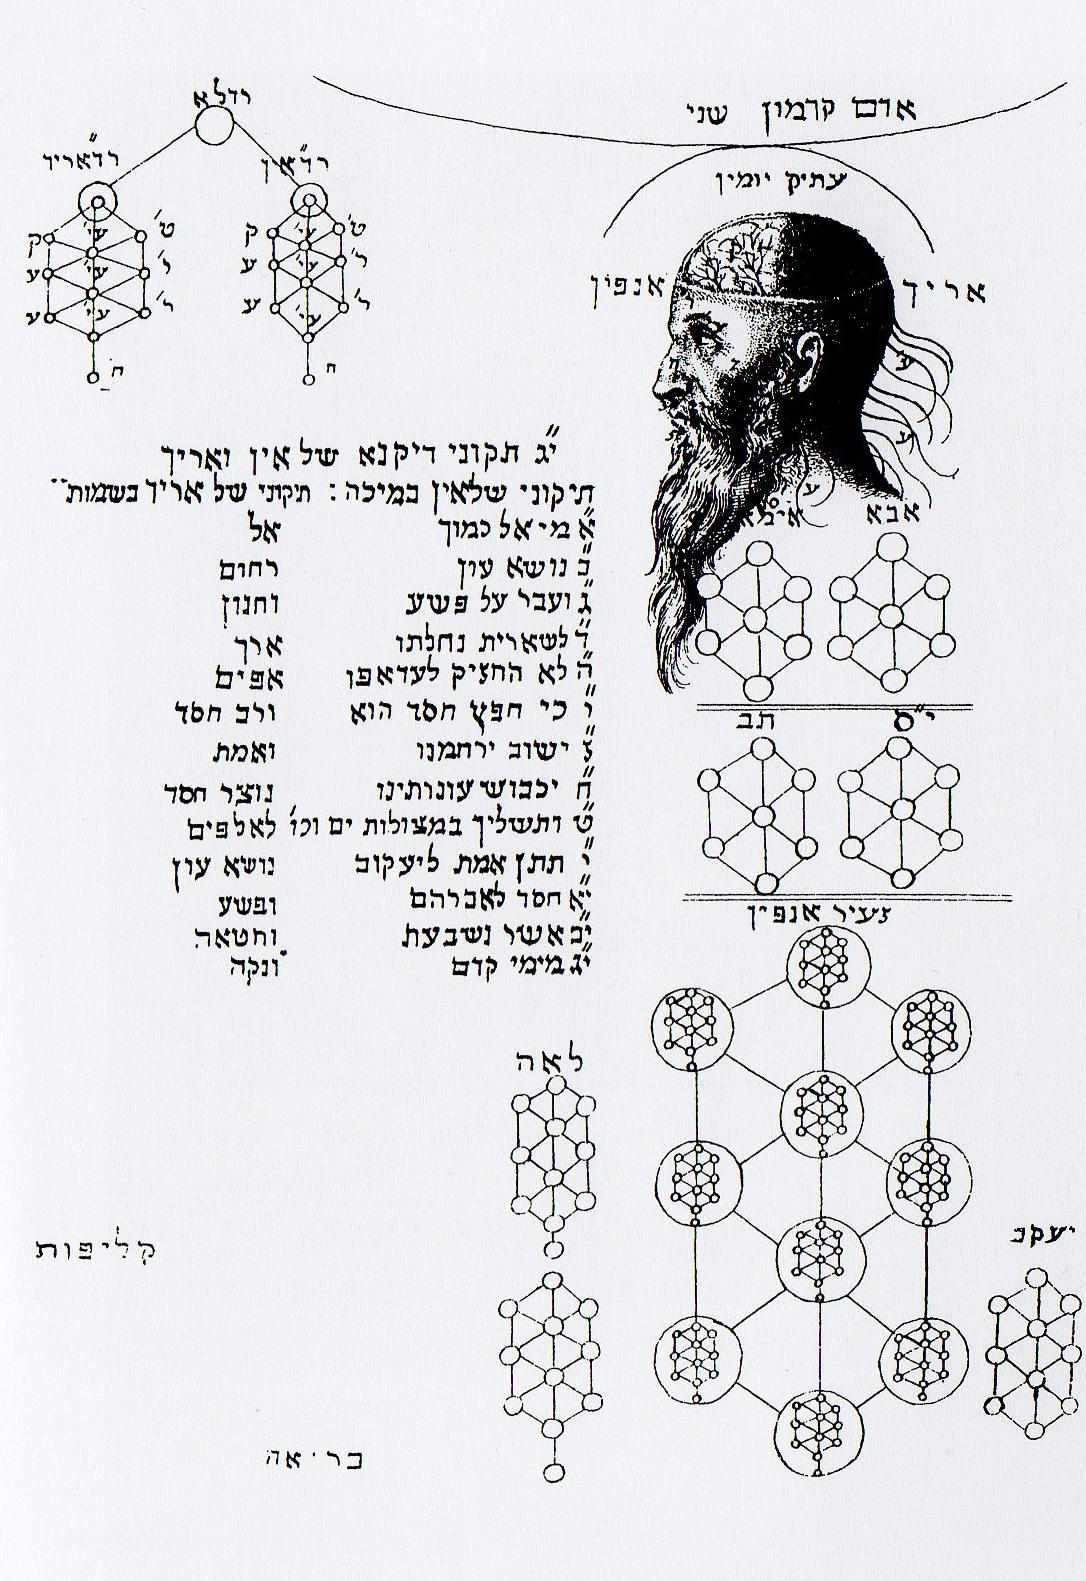 File:Complex qaballah.jpg - Wikipedia, the free encyclopedia